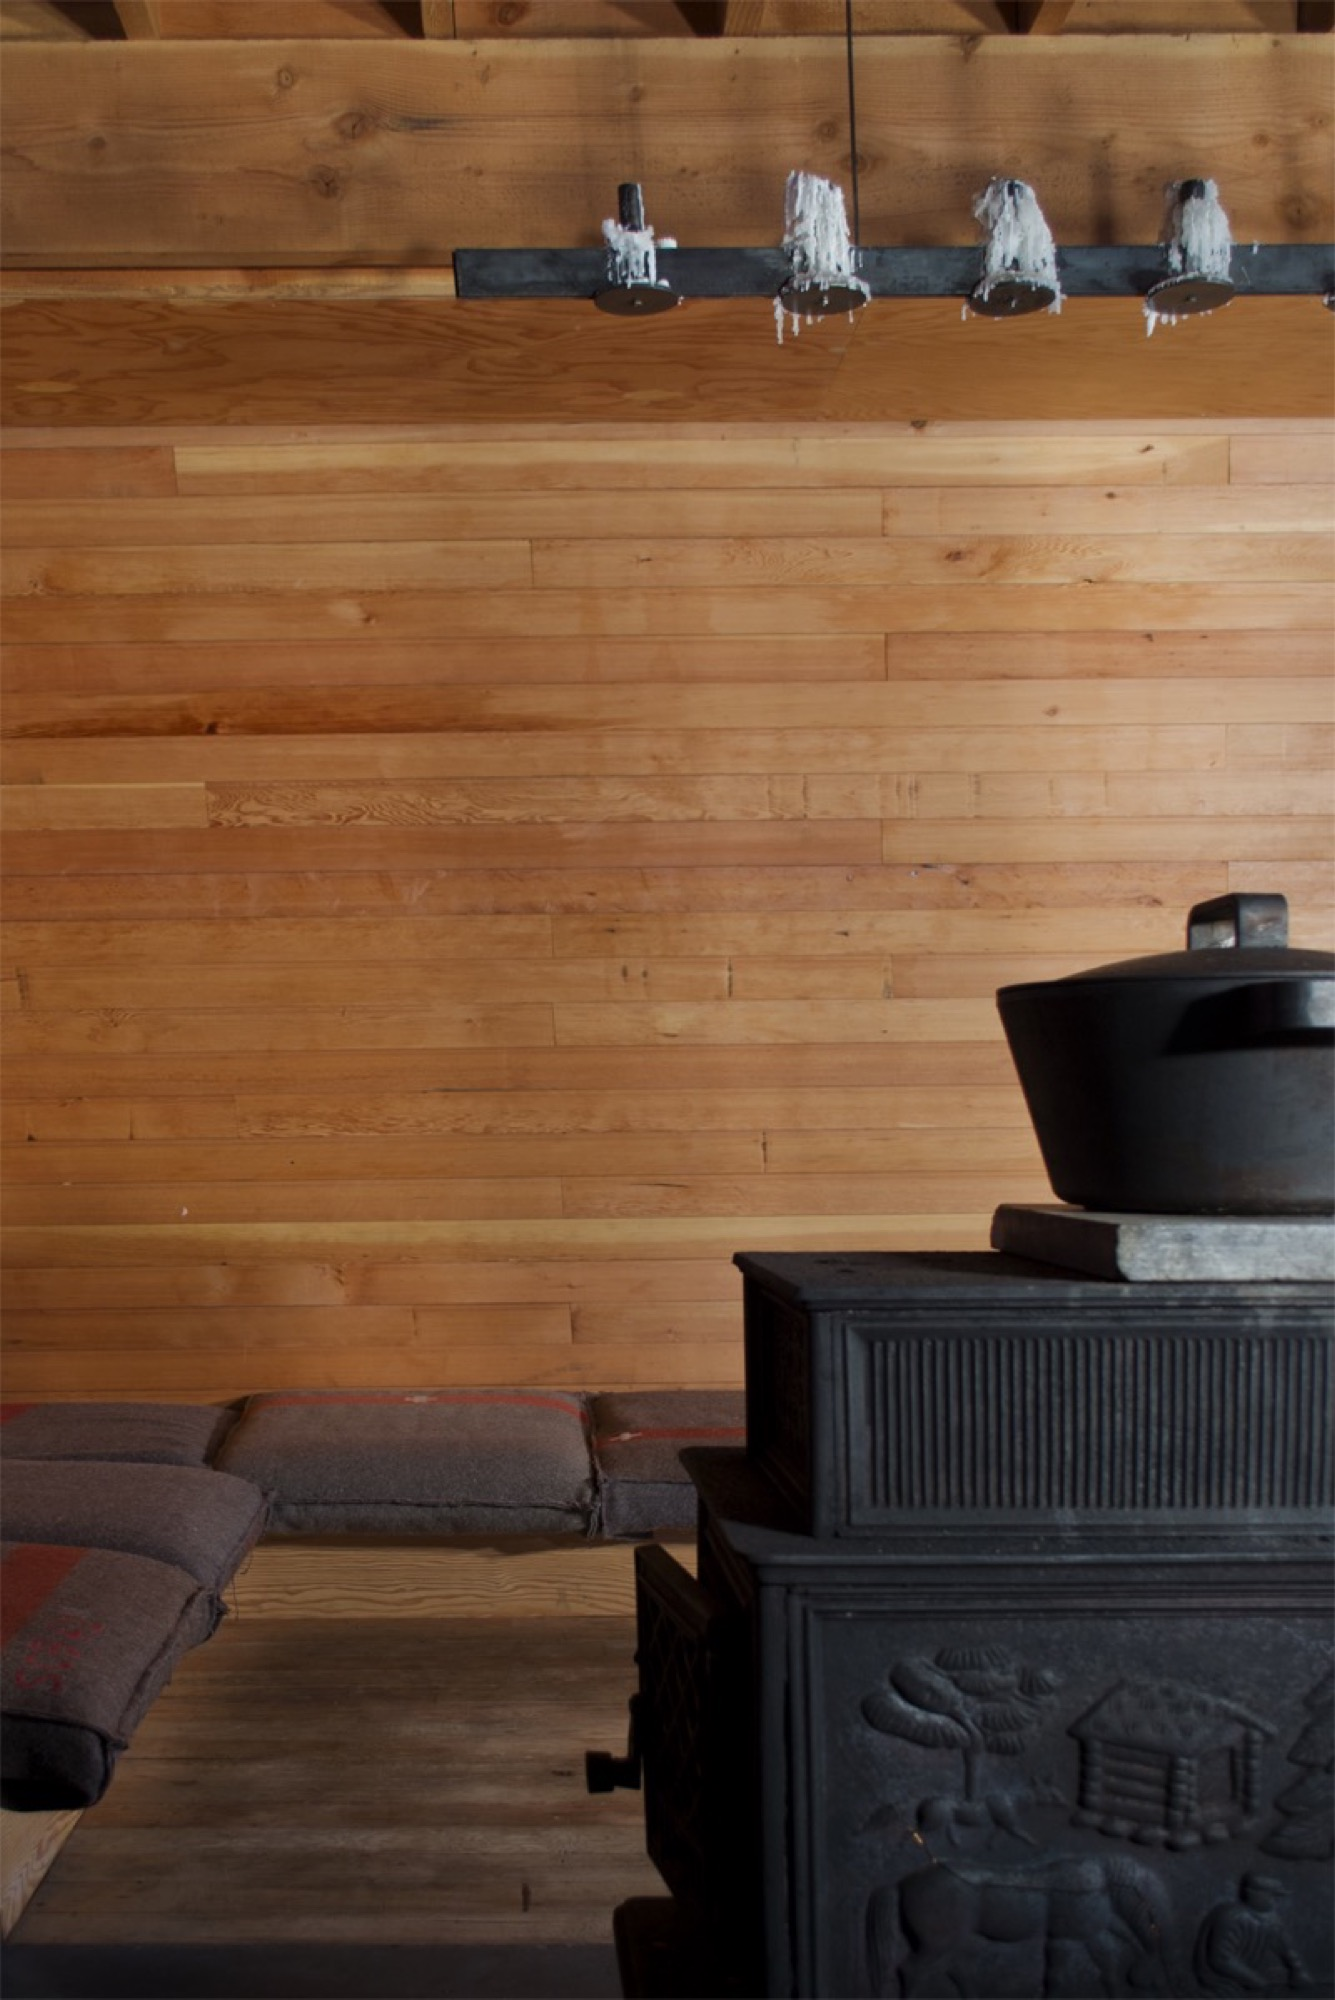 Iittala cast-iron pot designed by Björn Dahlström